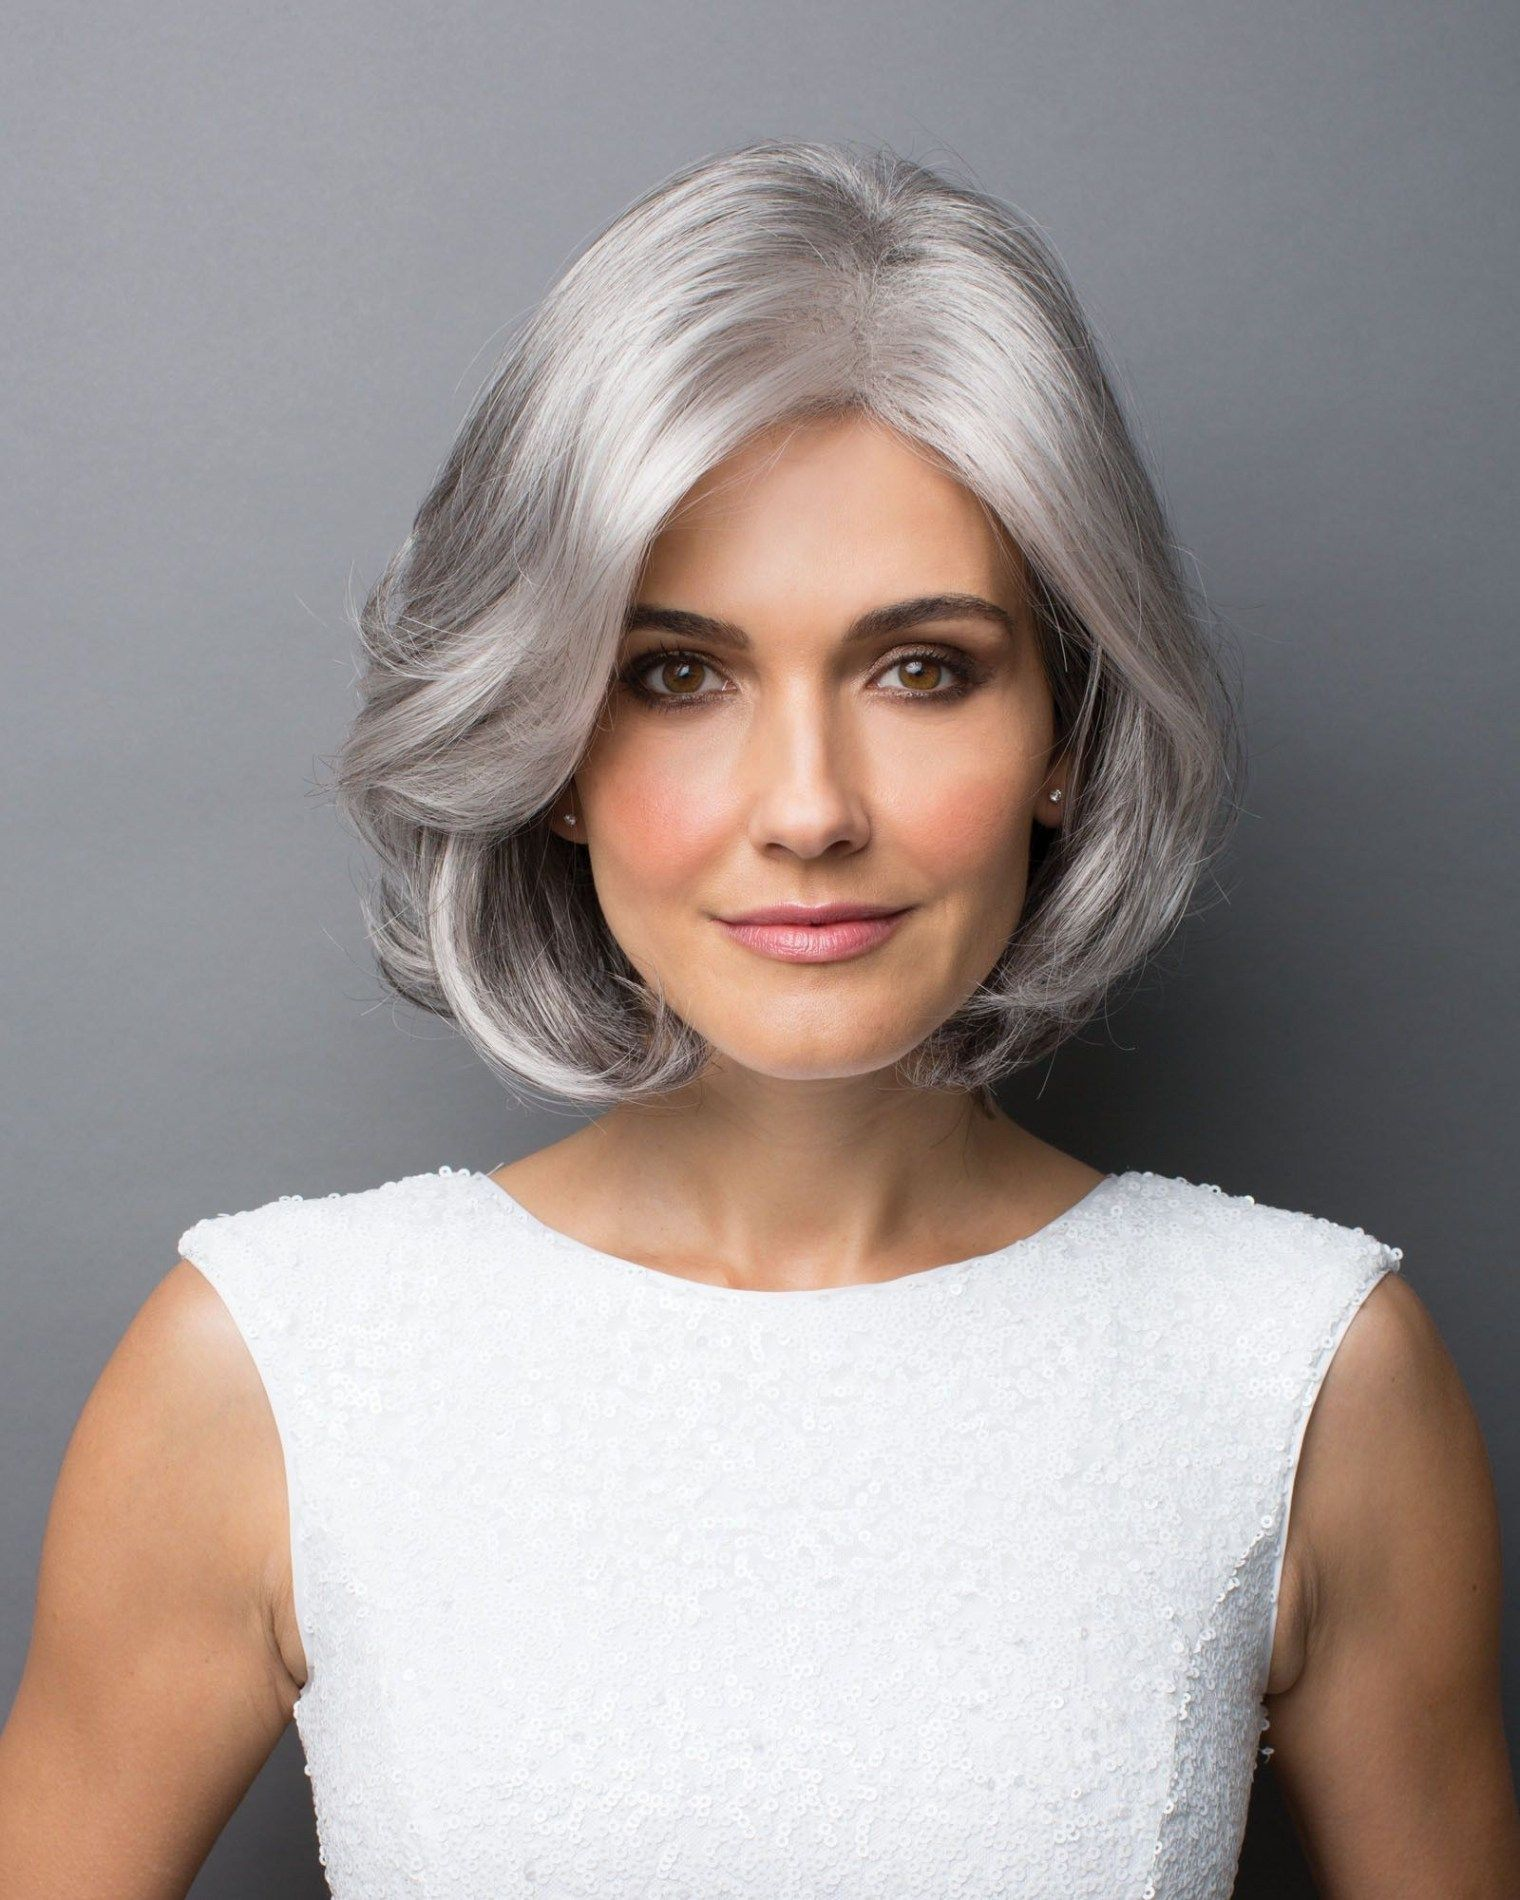 The Best Gray Hair Ideas In 2019 13 Attirepin Com Hair Styles Long Hair Styles Short Hair Styles